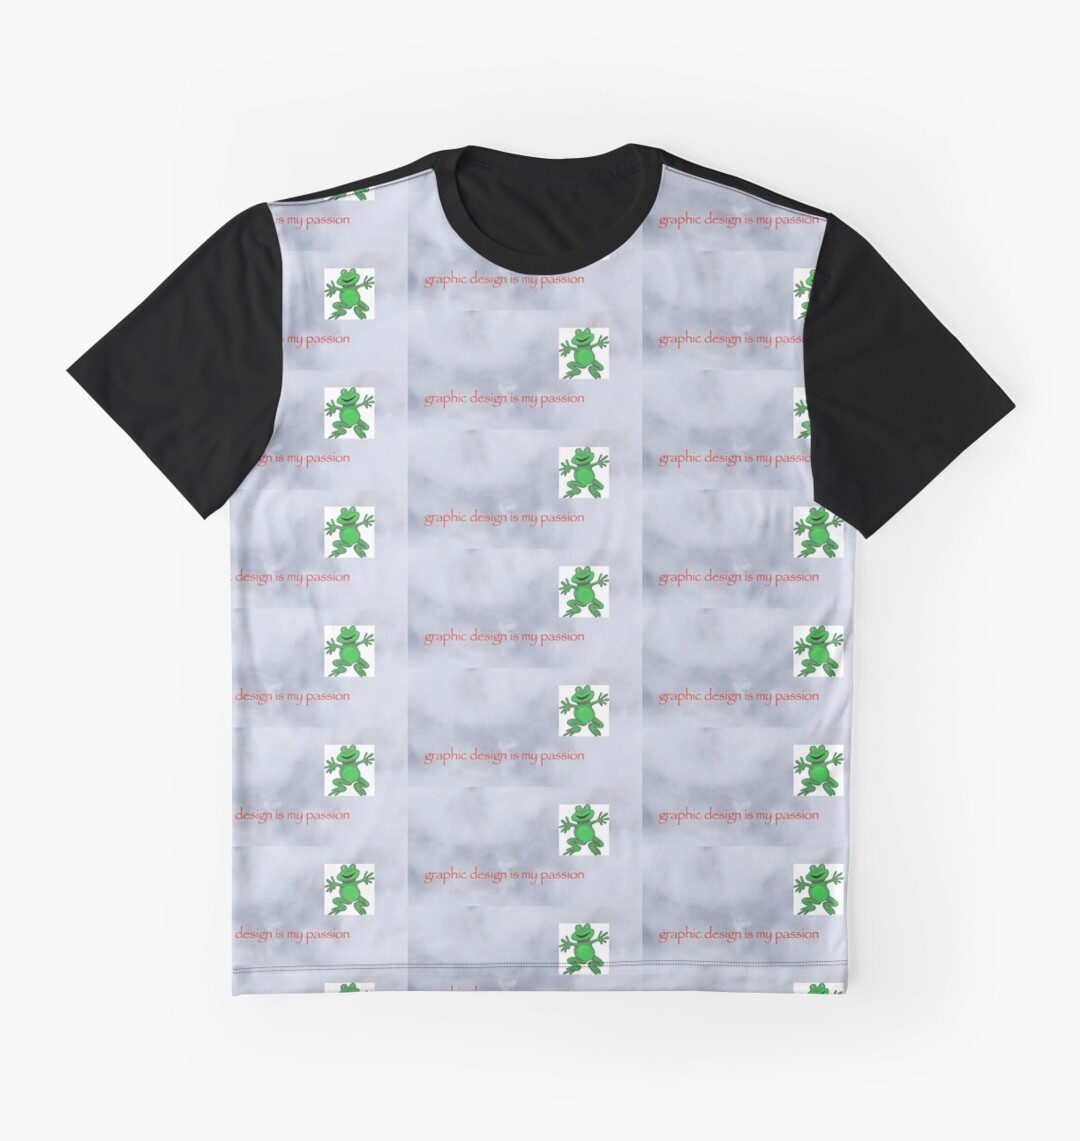 Design shirt redbubble - Graphic Design